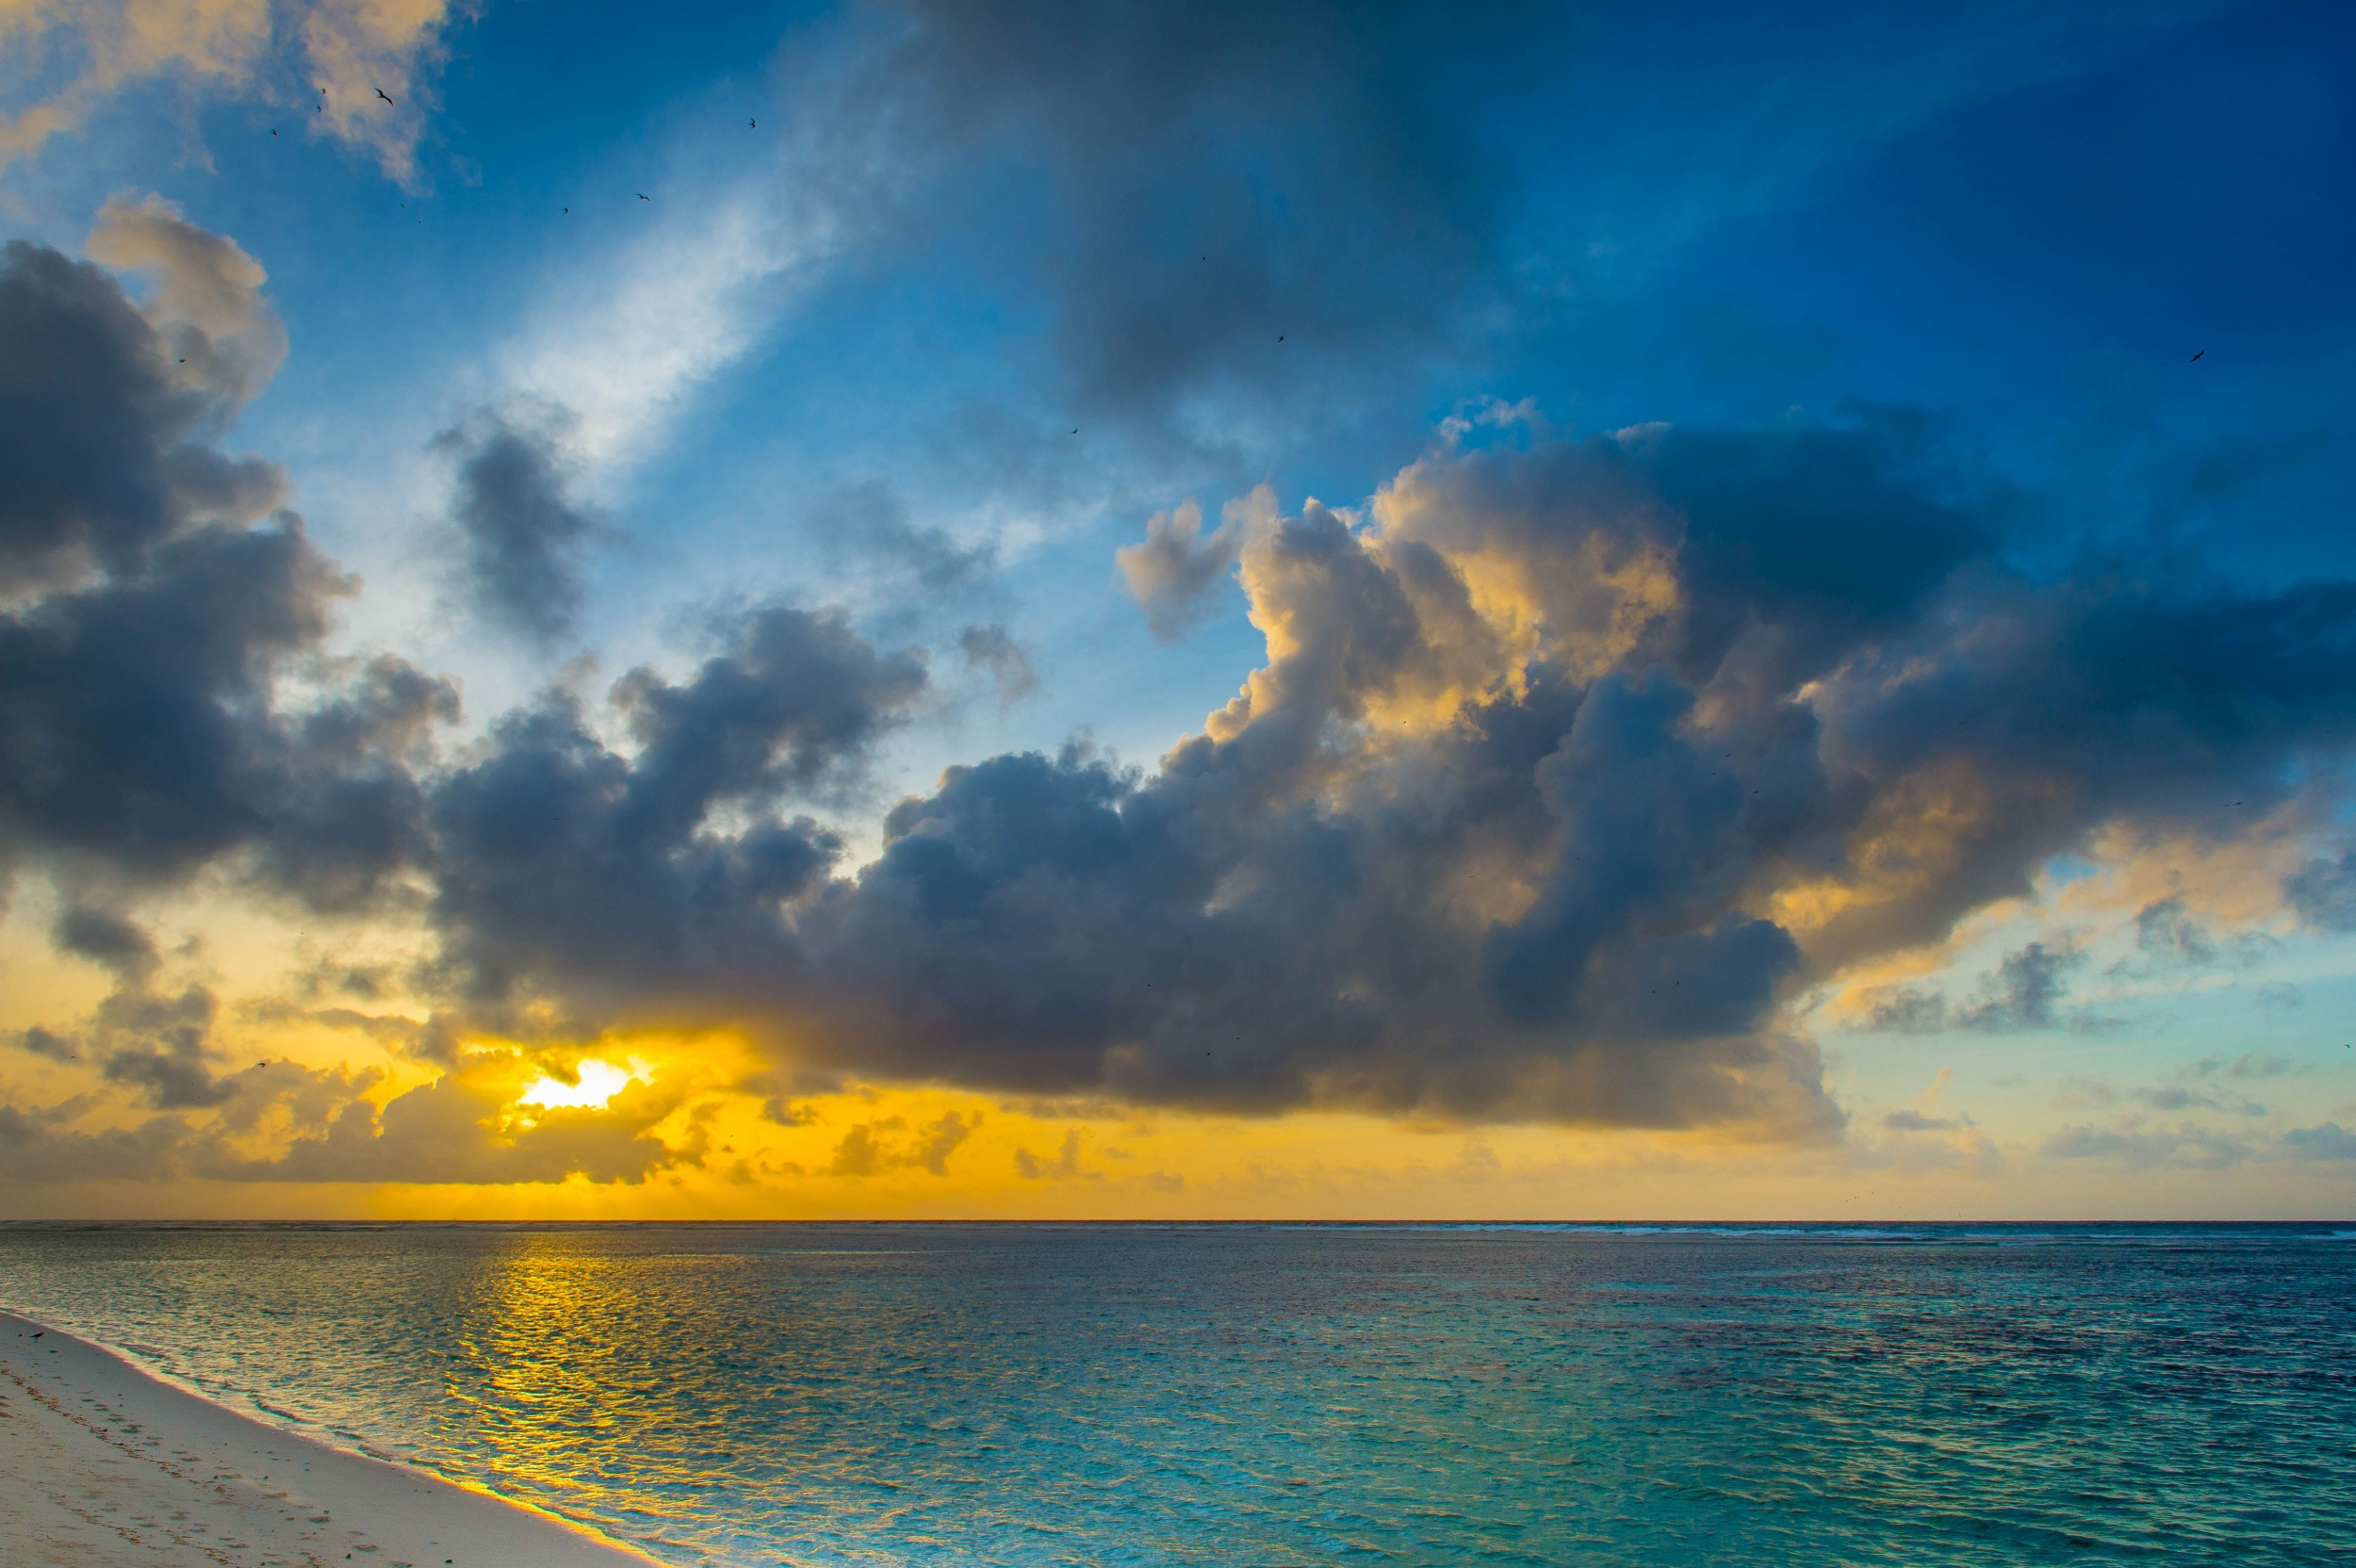 dawn peace sea landscape birds freedom hd wallpaper 2500x1664